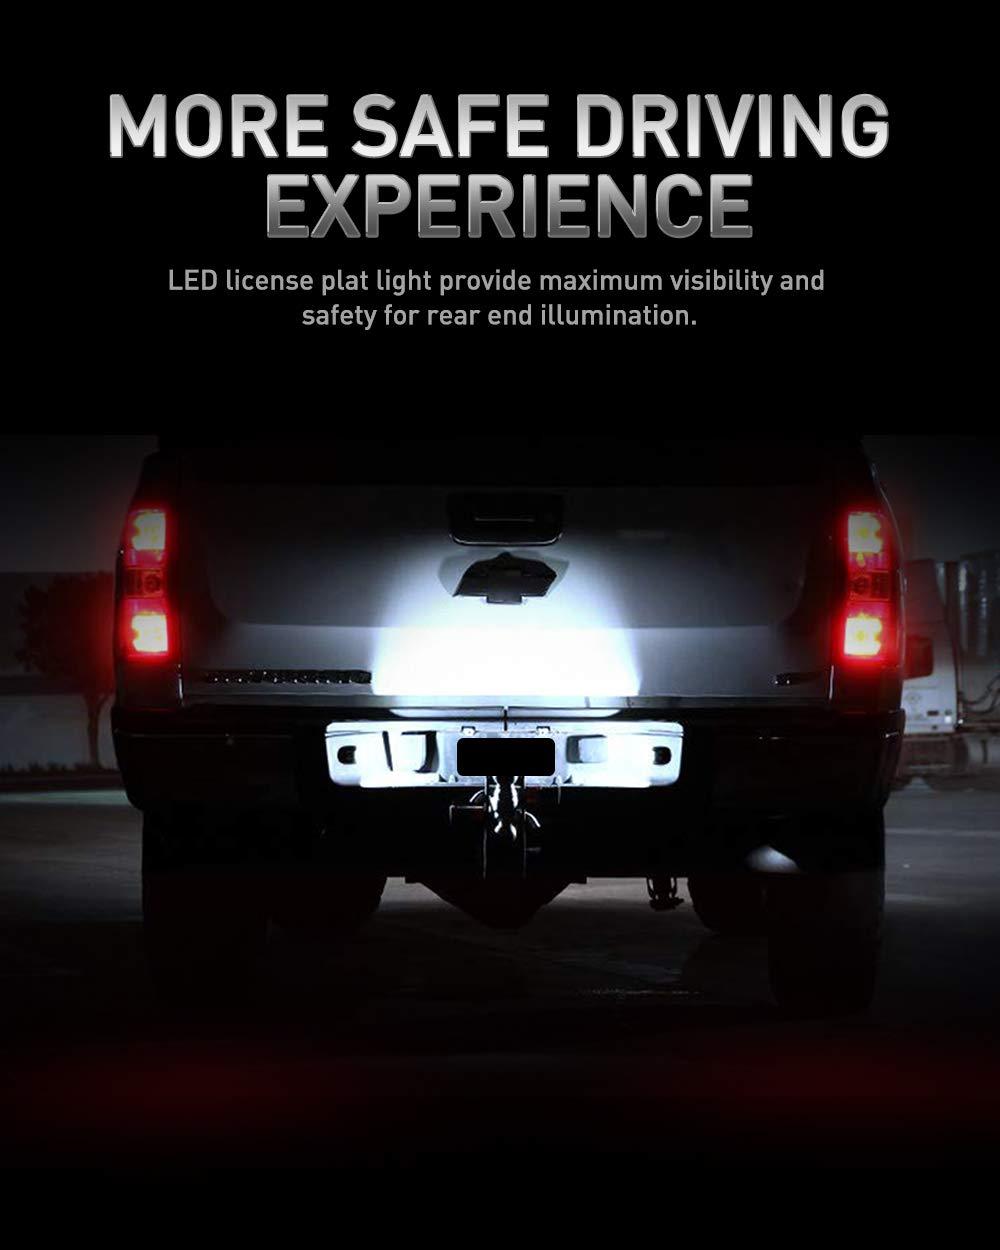 License Plate Light for F150,LED License Plate Lights Lamp Assembly For Ford F-150 F-250 F-350 F-450 F-550 Superduty Ranger Pickup Truck Explorer Bronco Excursion Expedition,6000K White LED Lights